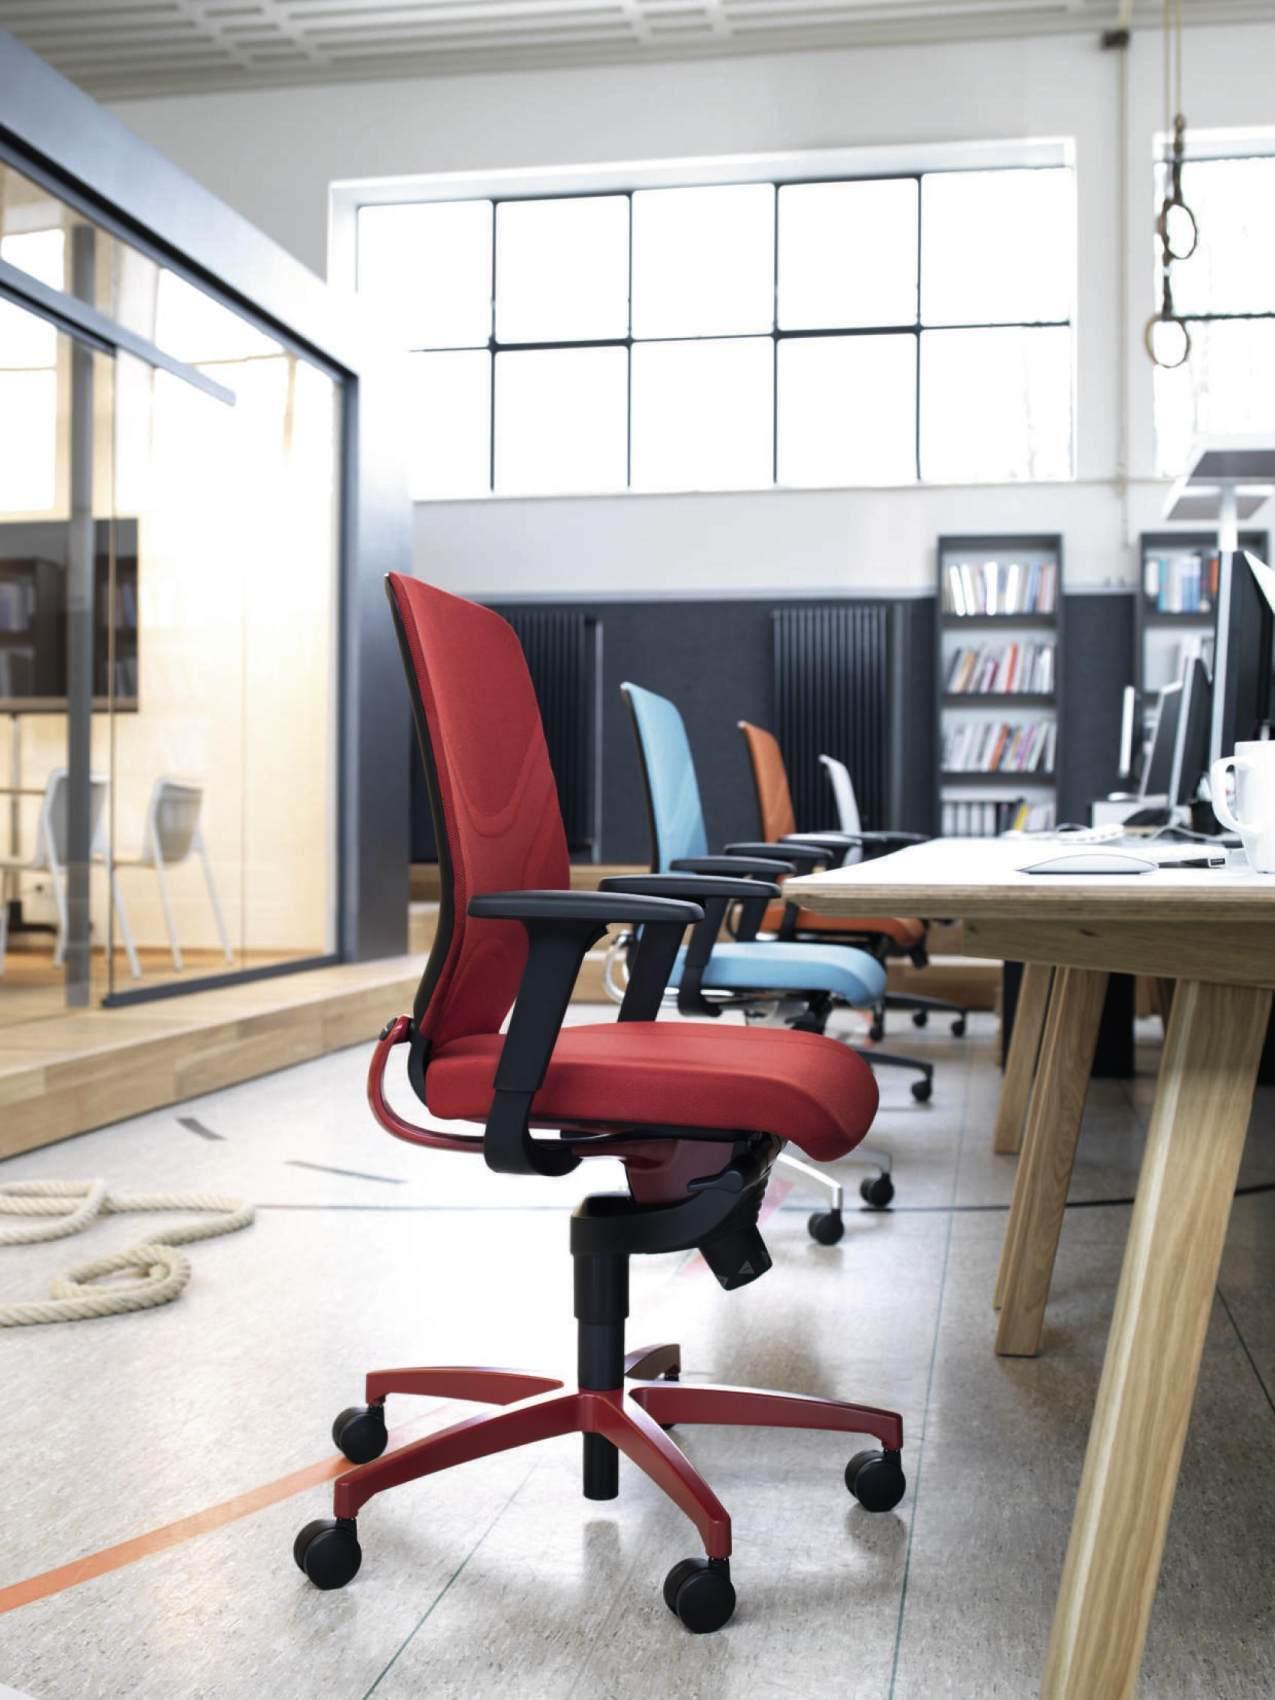 In 184/7 Office Swivel Chair Wilkhahn